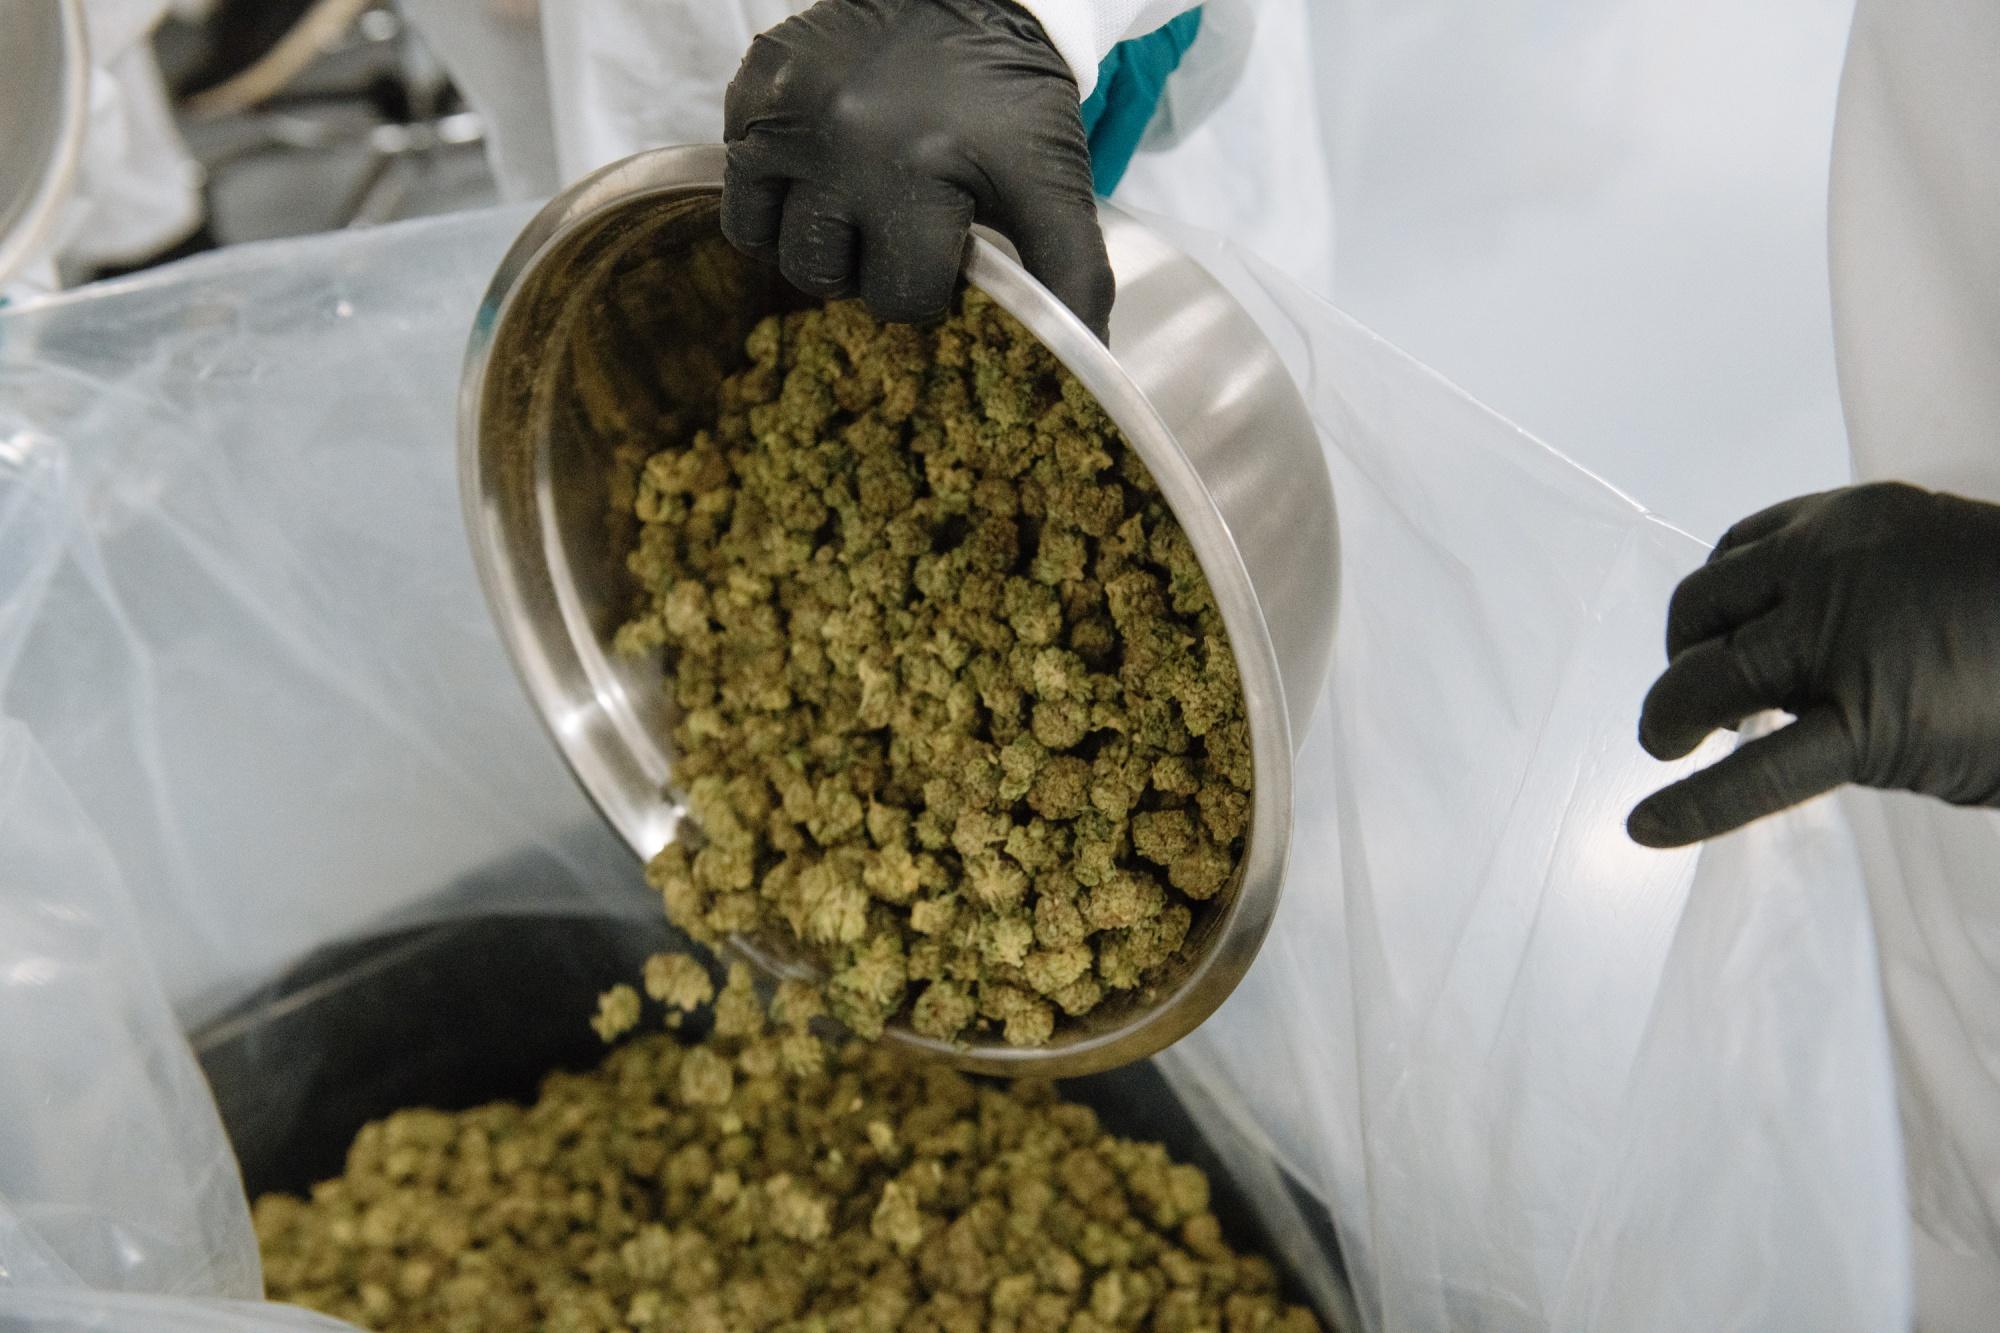 CannTrust Tumbles Again as Marijuana License at Risk - Bloomberg